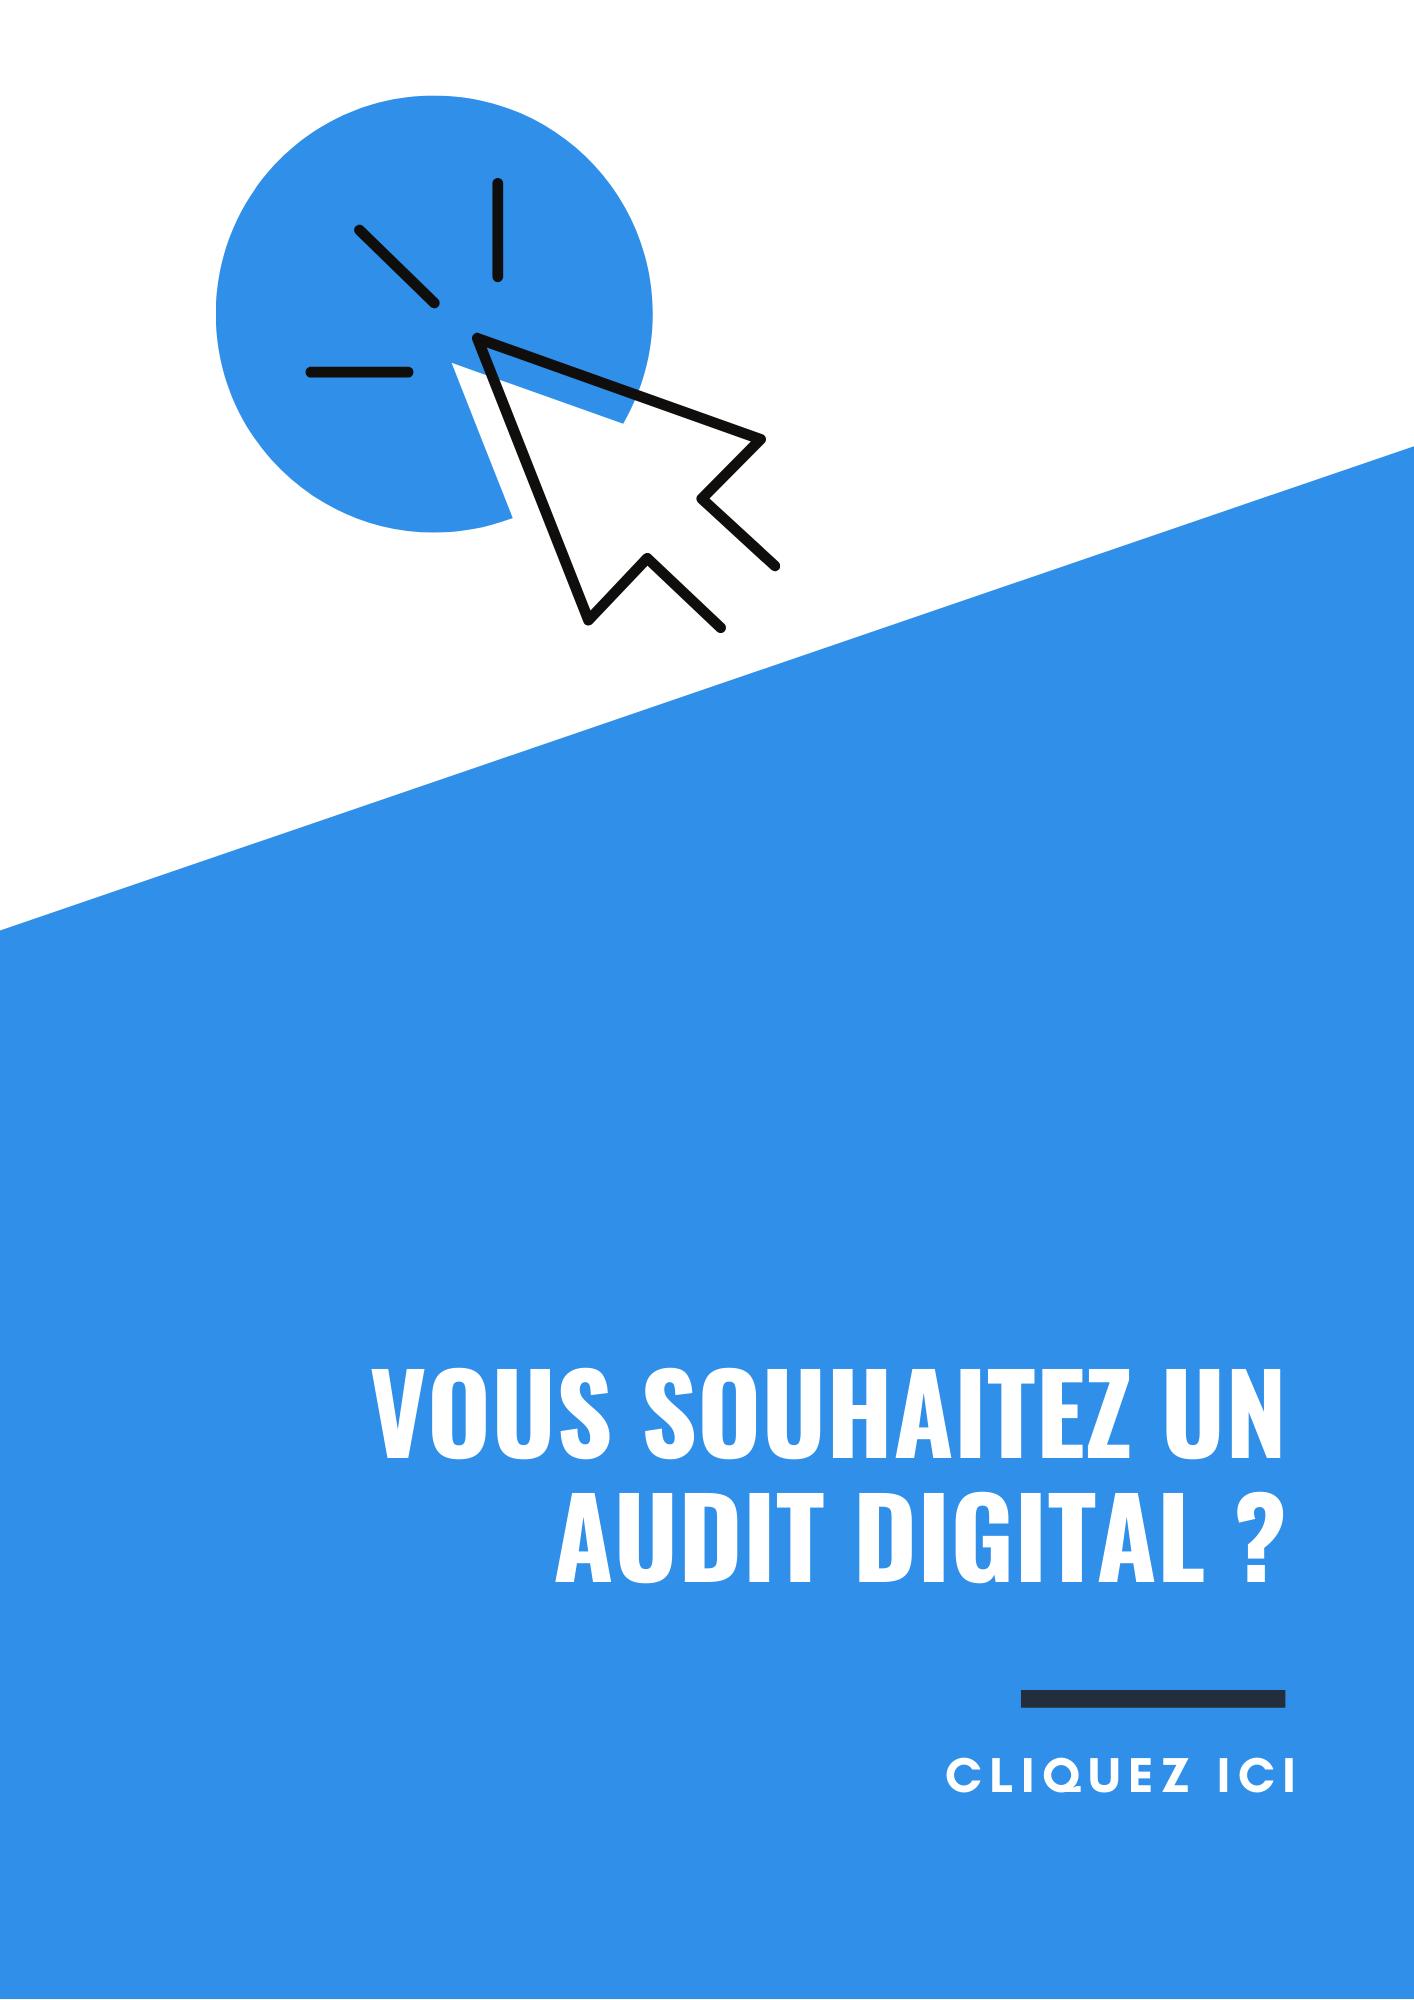 audit digital oui digitalise